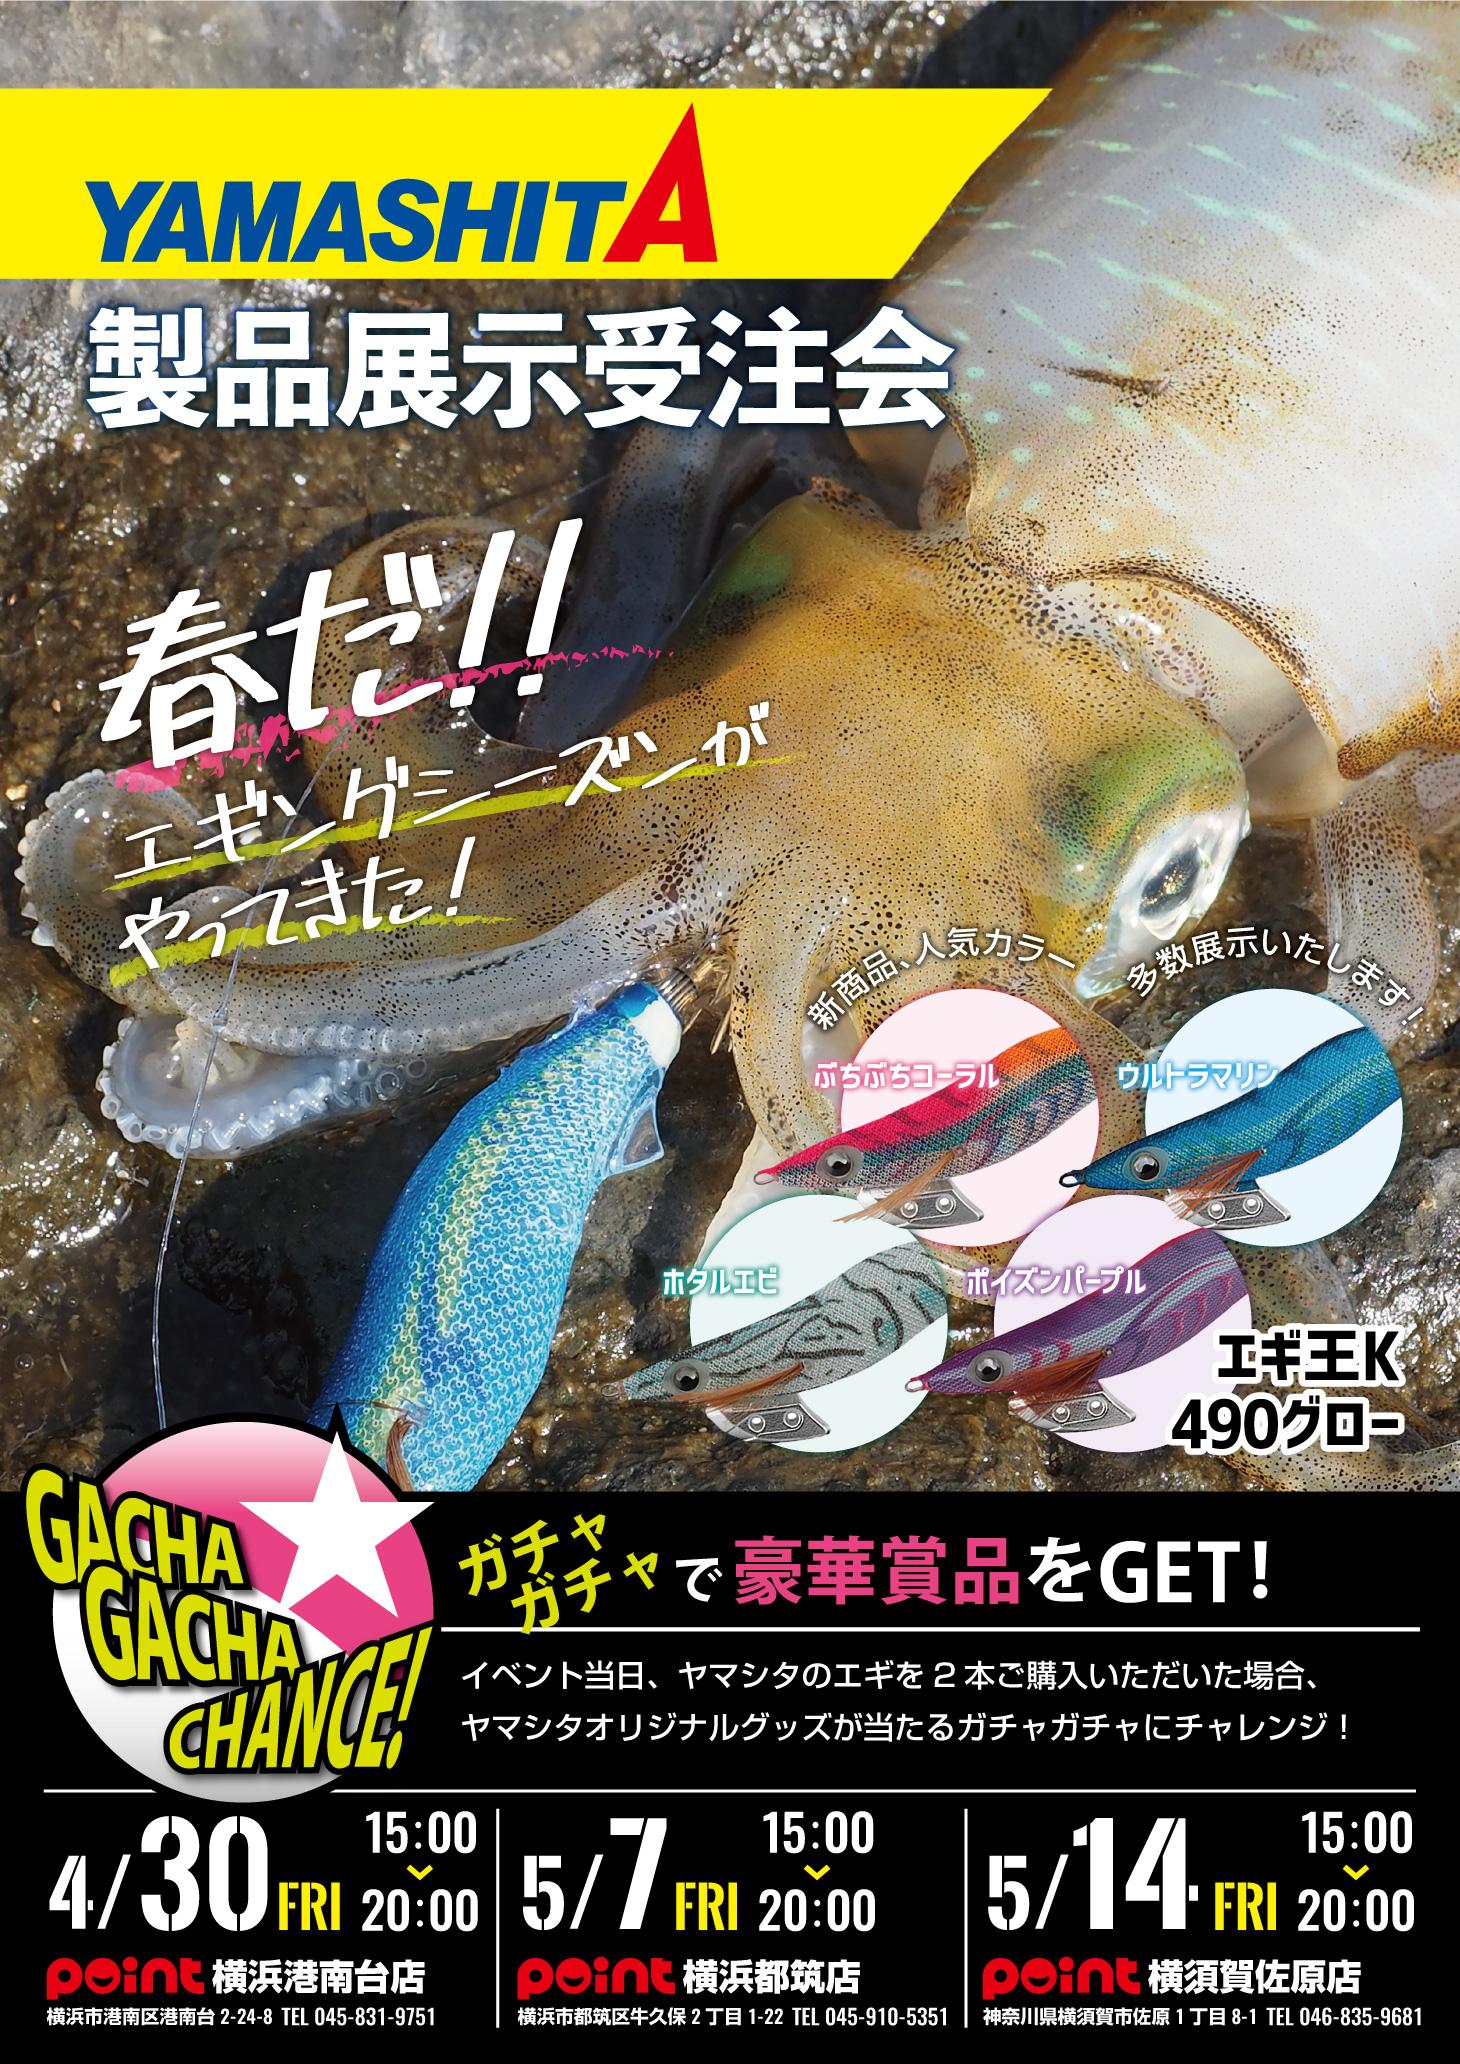 Yamashita製品展示受注会 港南台・都筑・横須賀